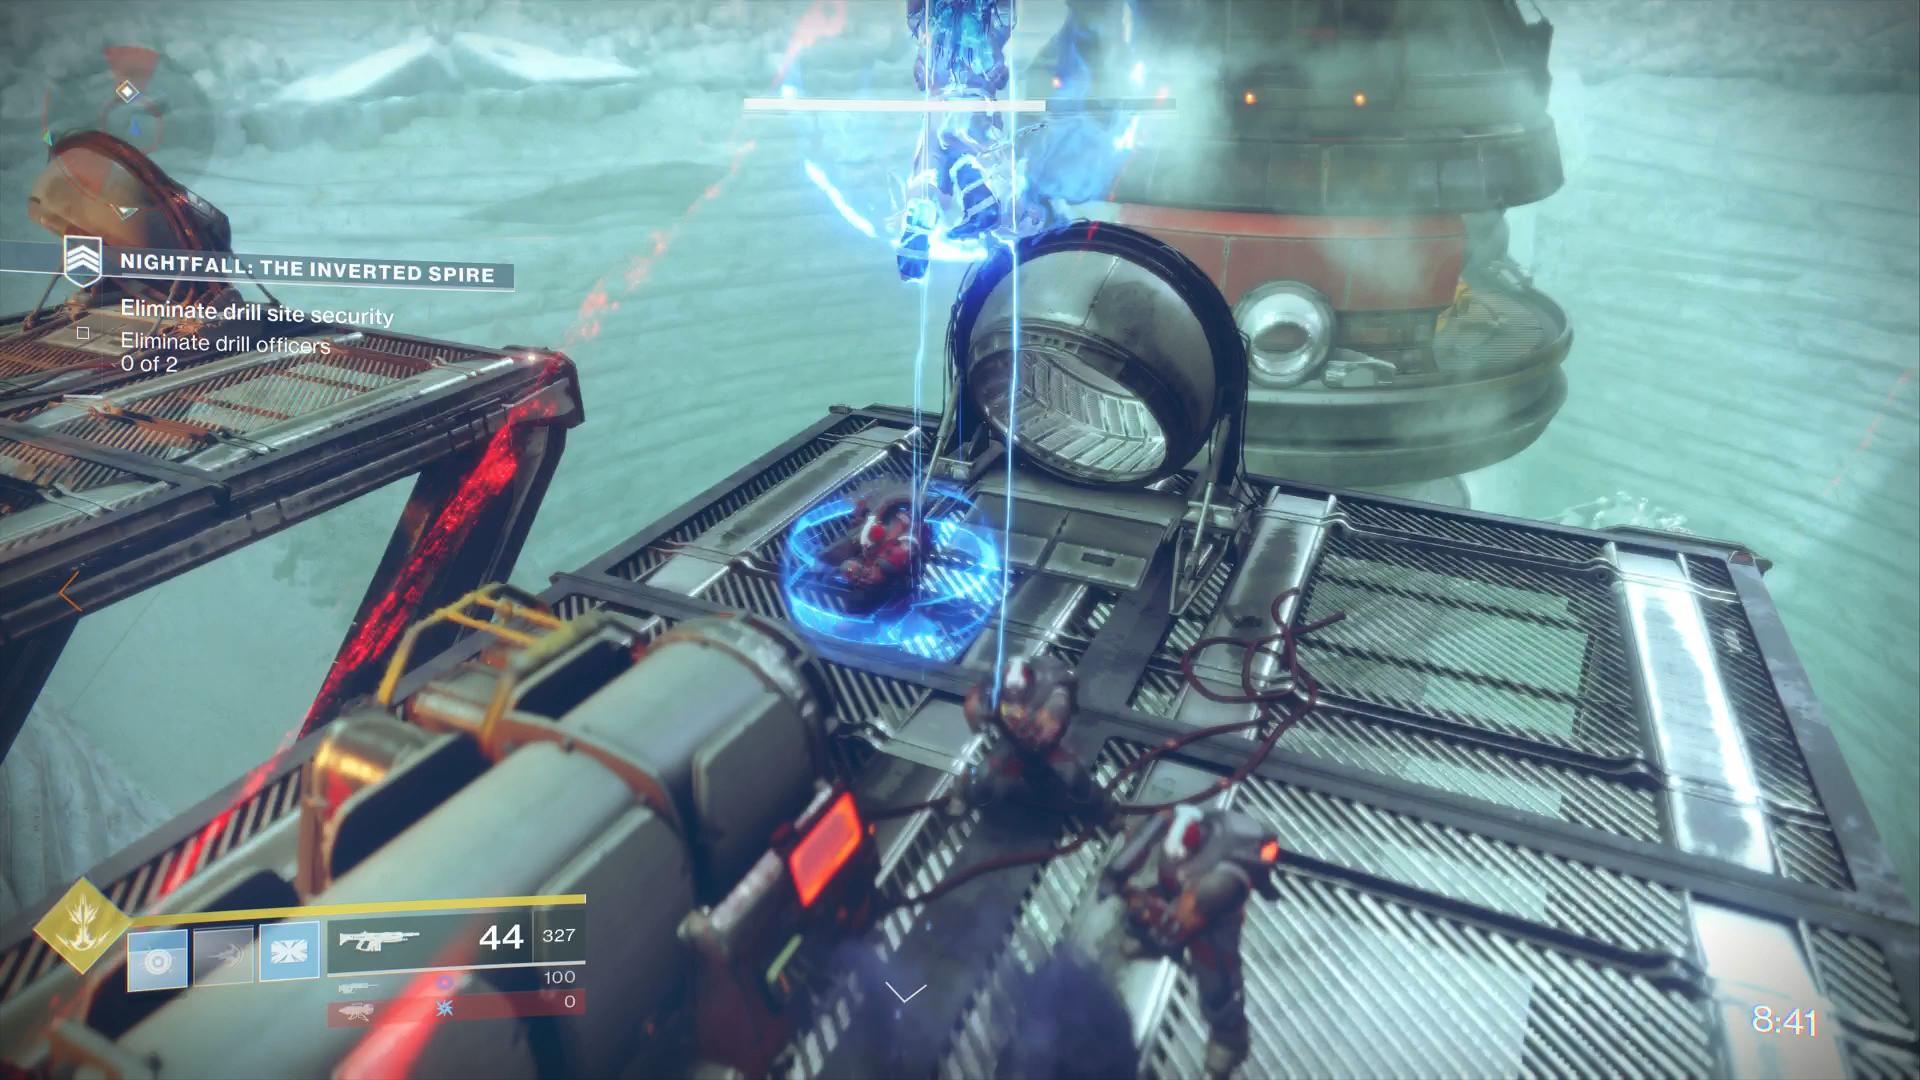 Destiny 2 guide: Inverted Spire Nightfall walkthrough - Polygon